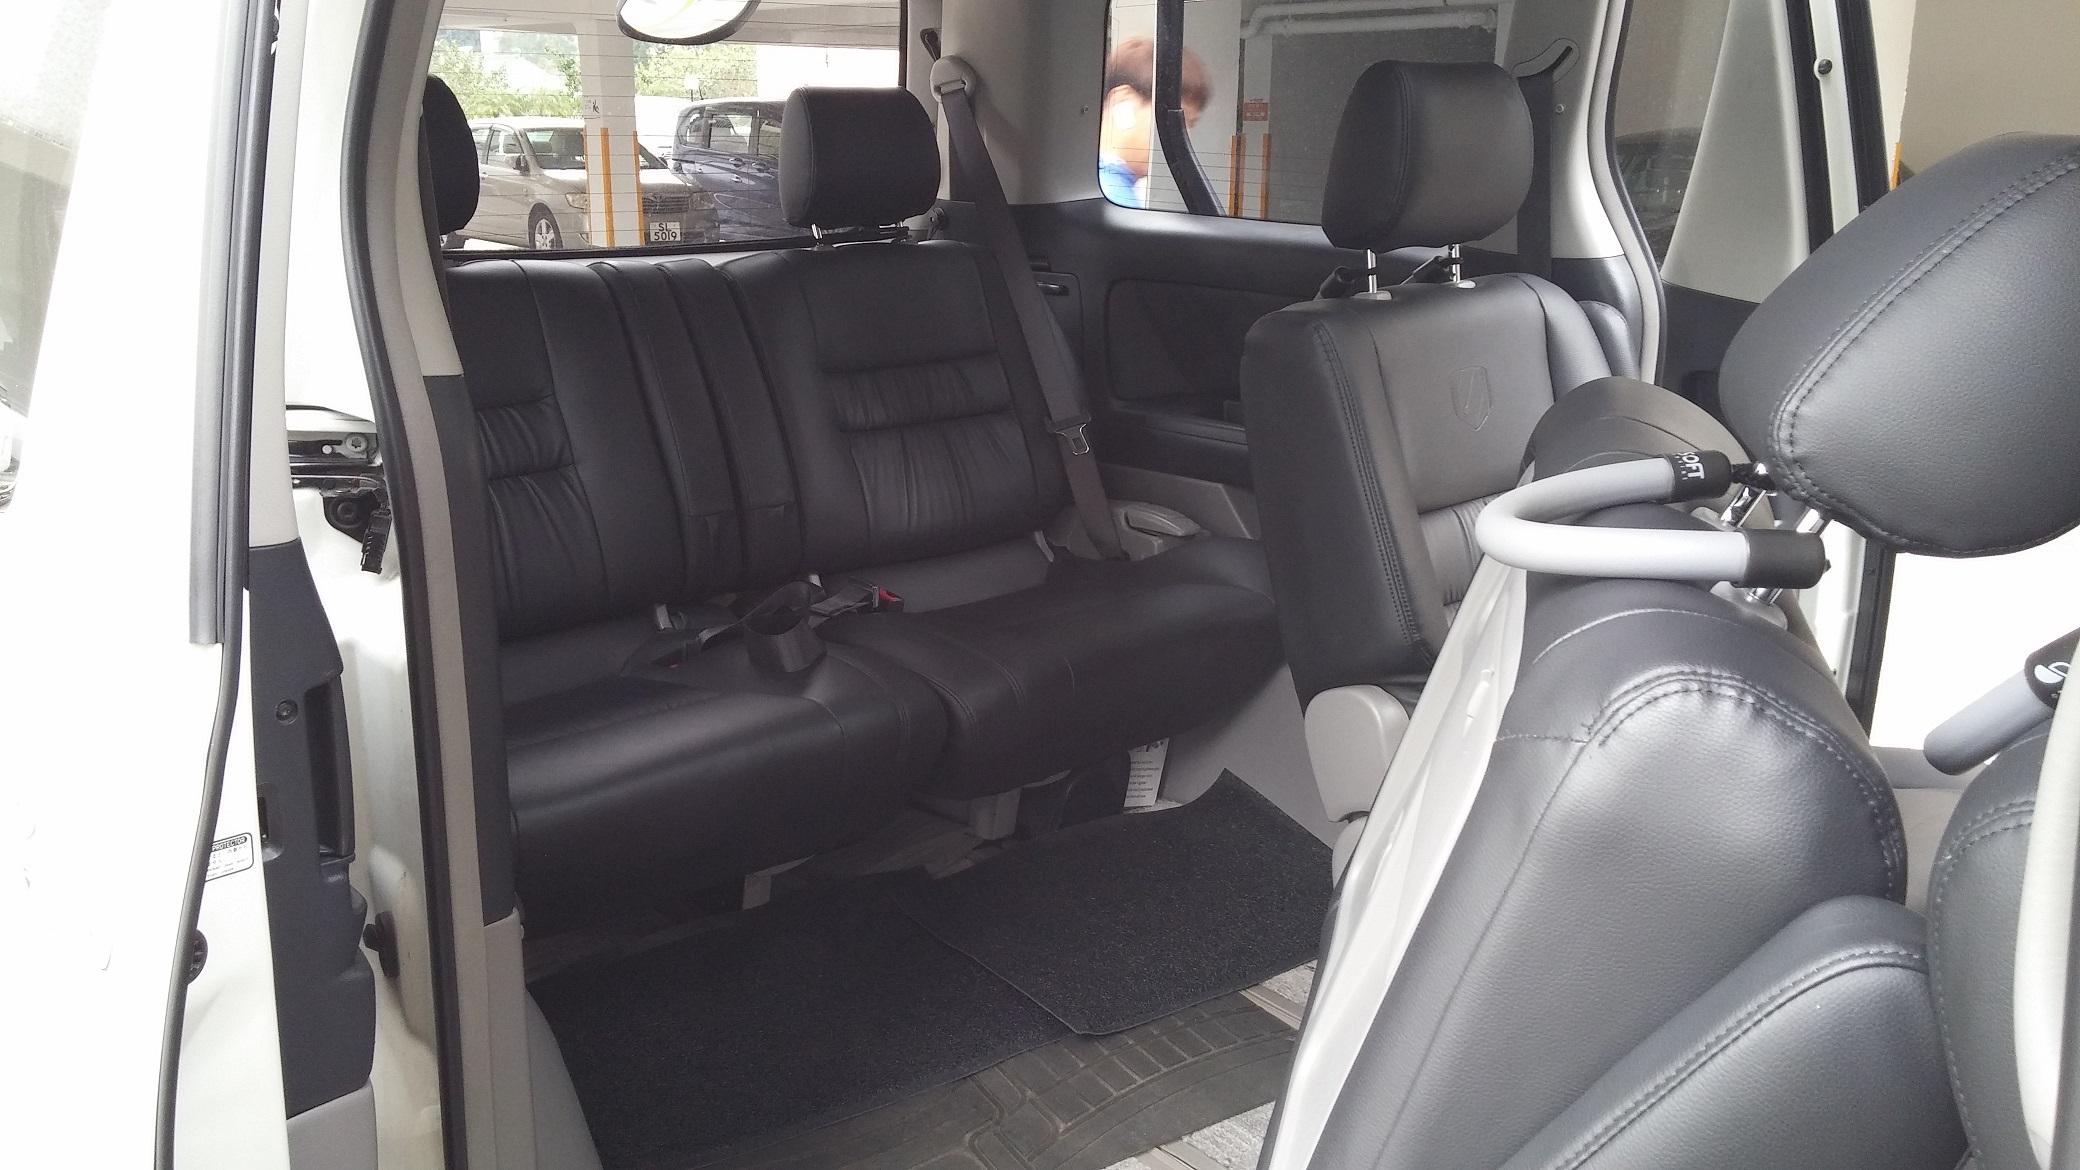 Alphard back row seating